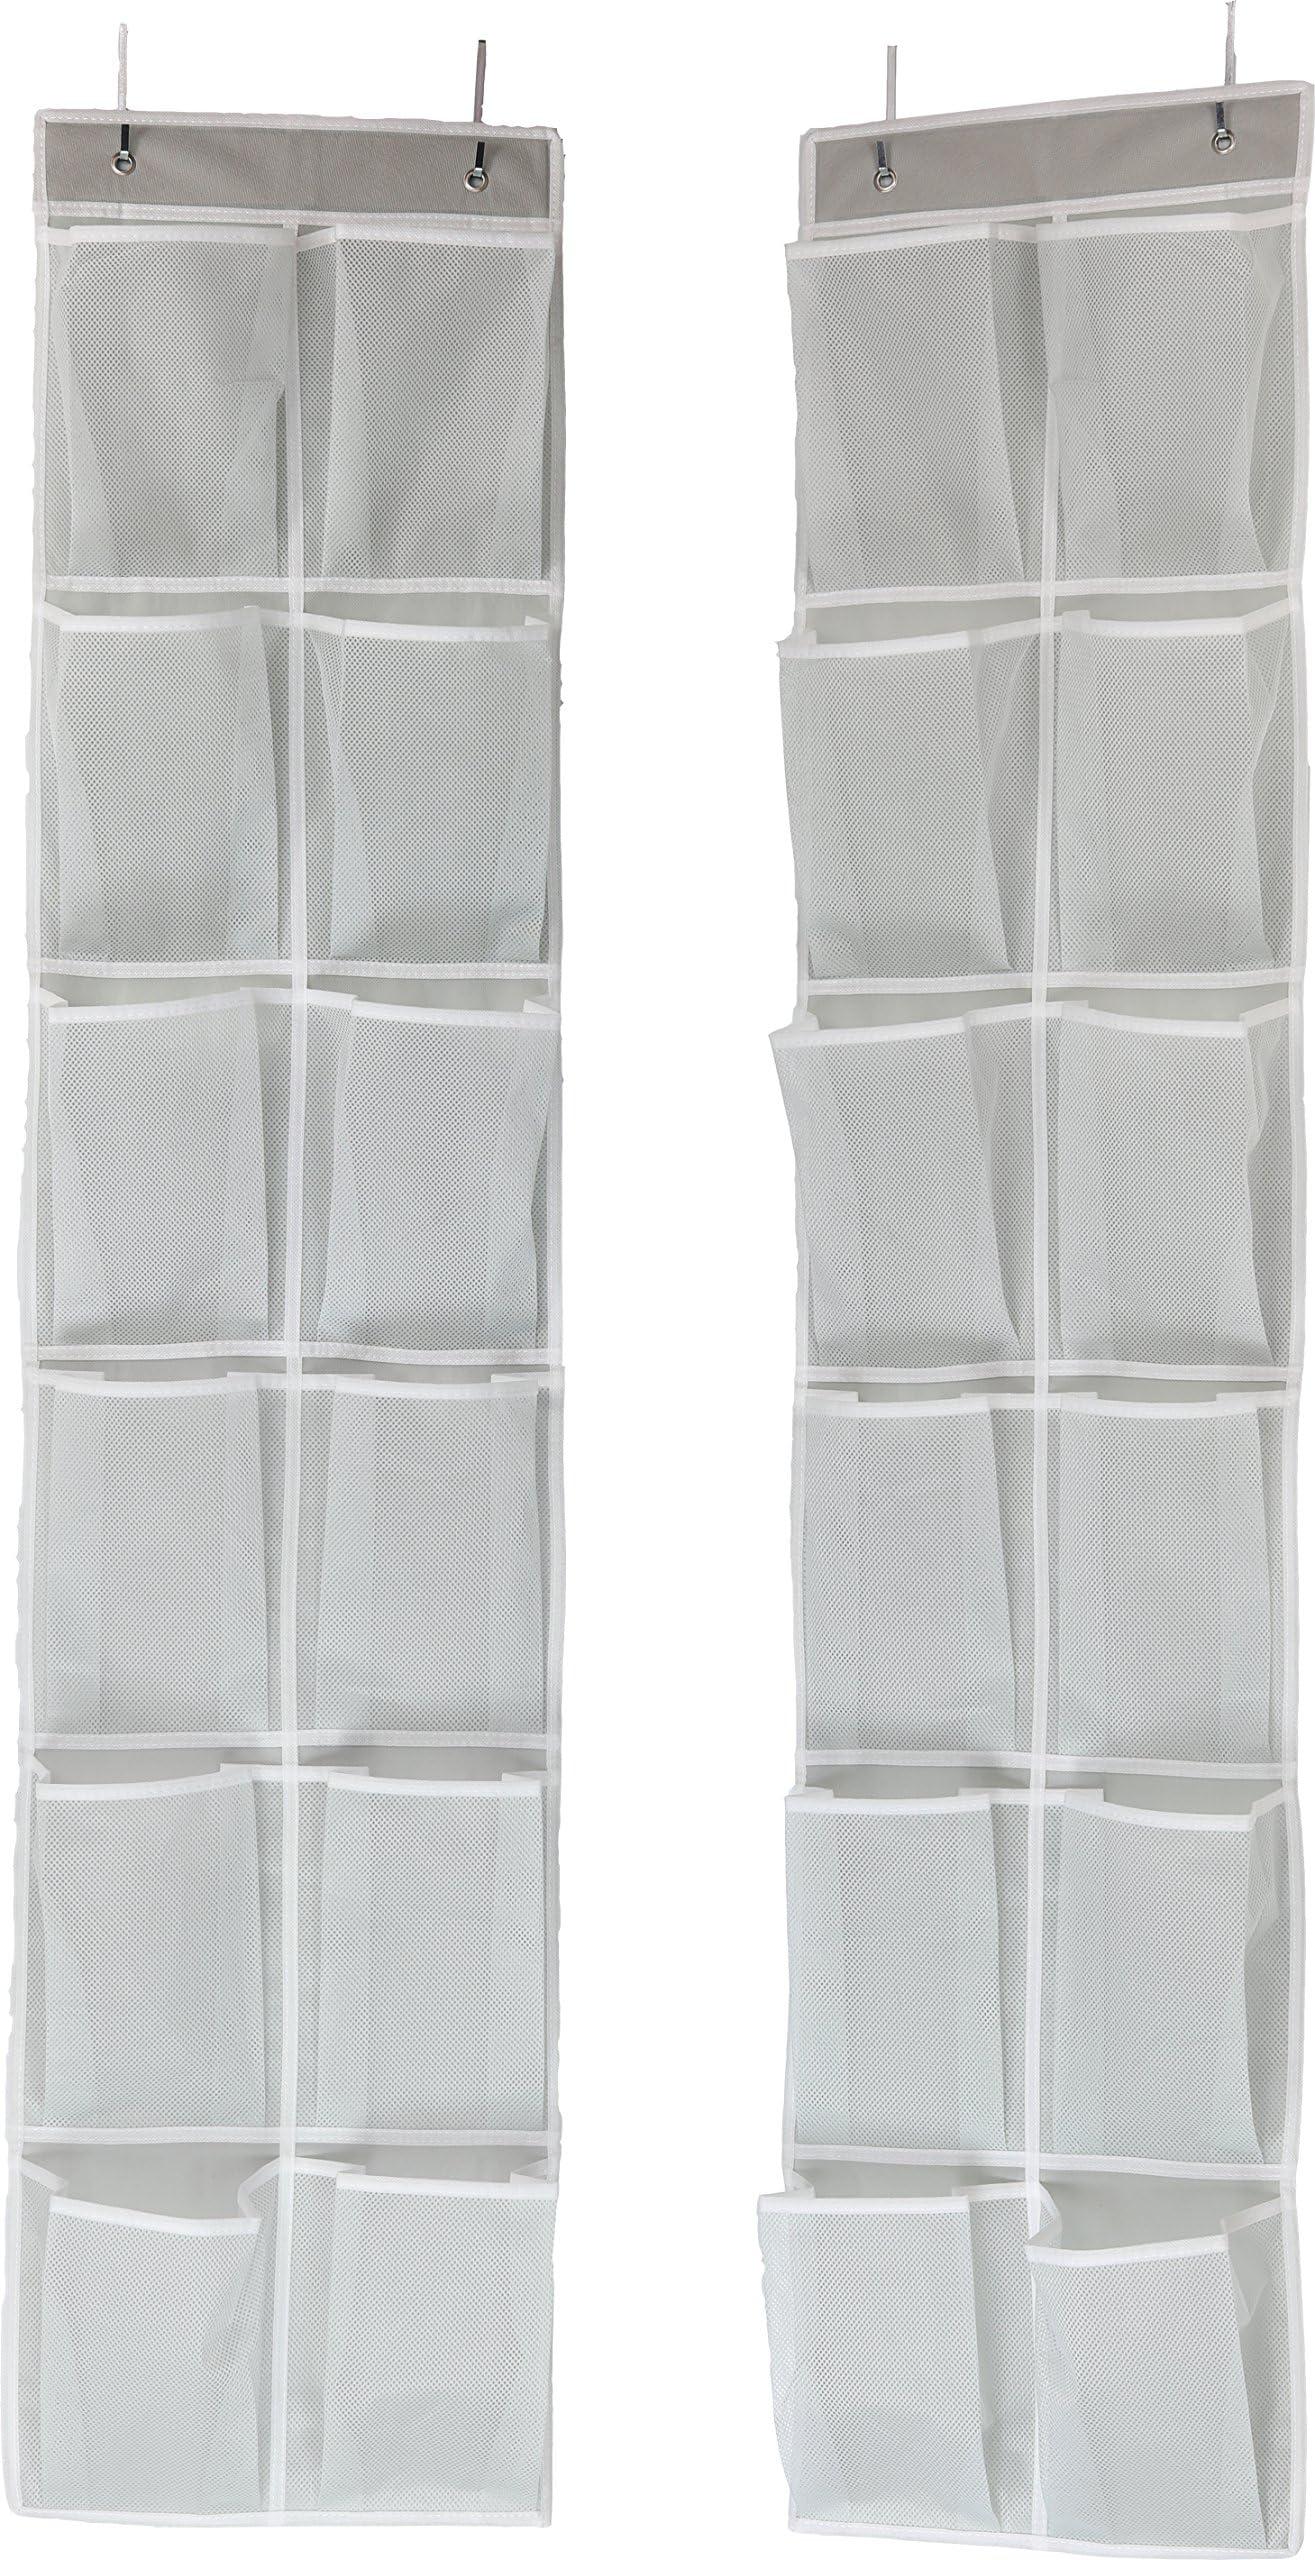 SimpleHouseware 24 Pockets - 2PK 12 Large Pockets Over Door Hanging Shoe Organizer, Grey